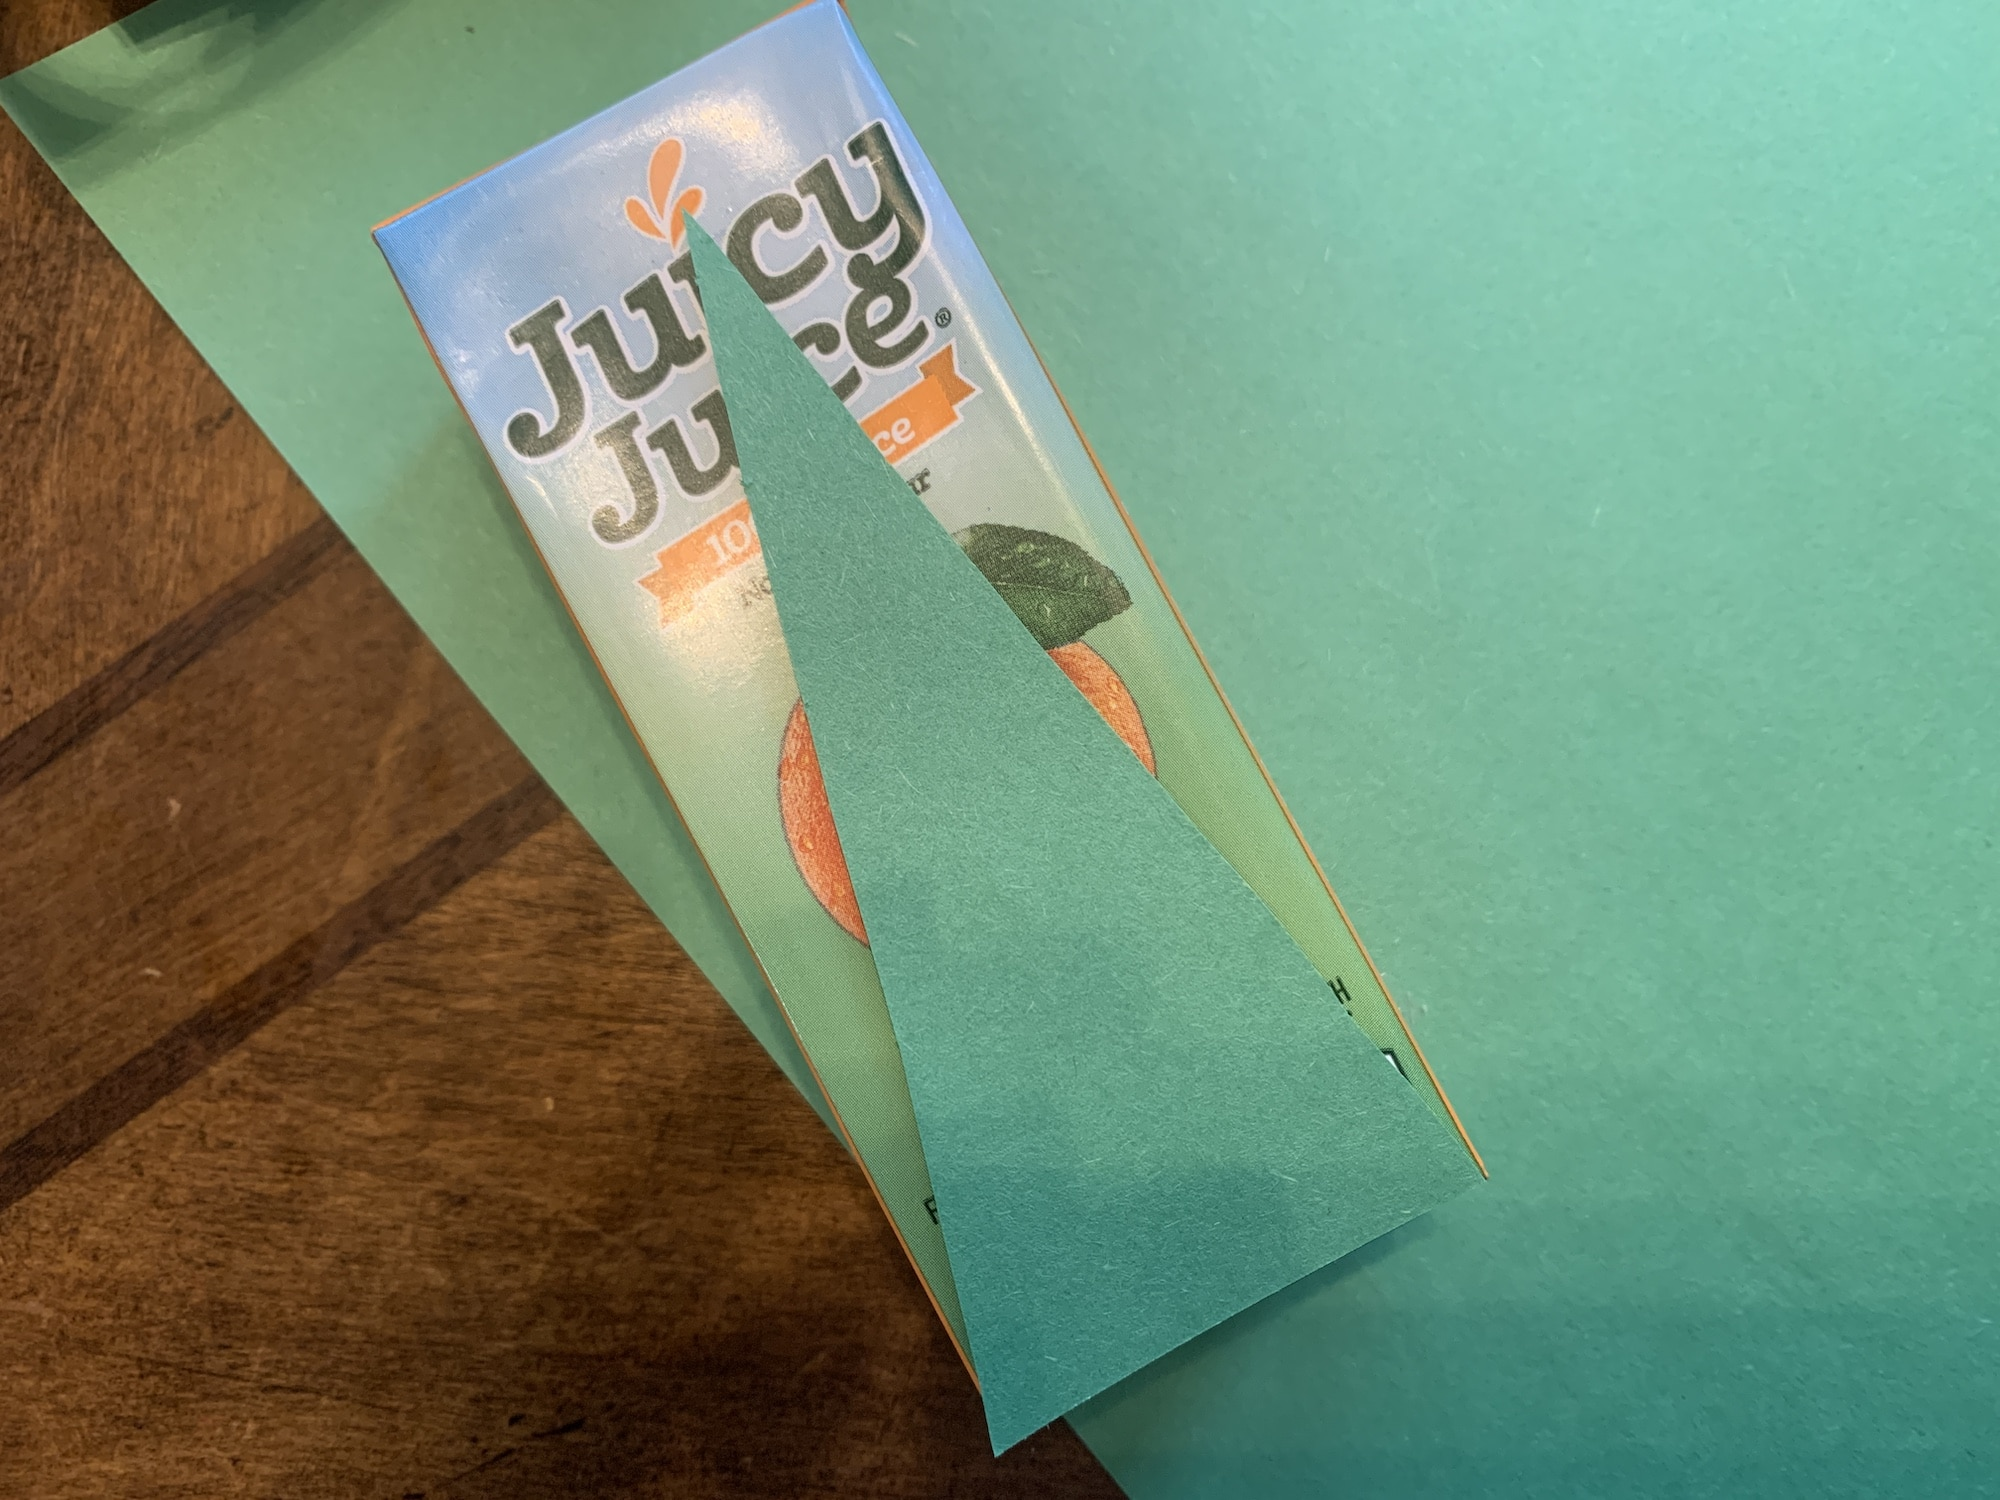 christmas tree cutout on juice box